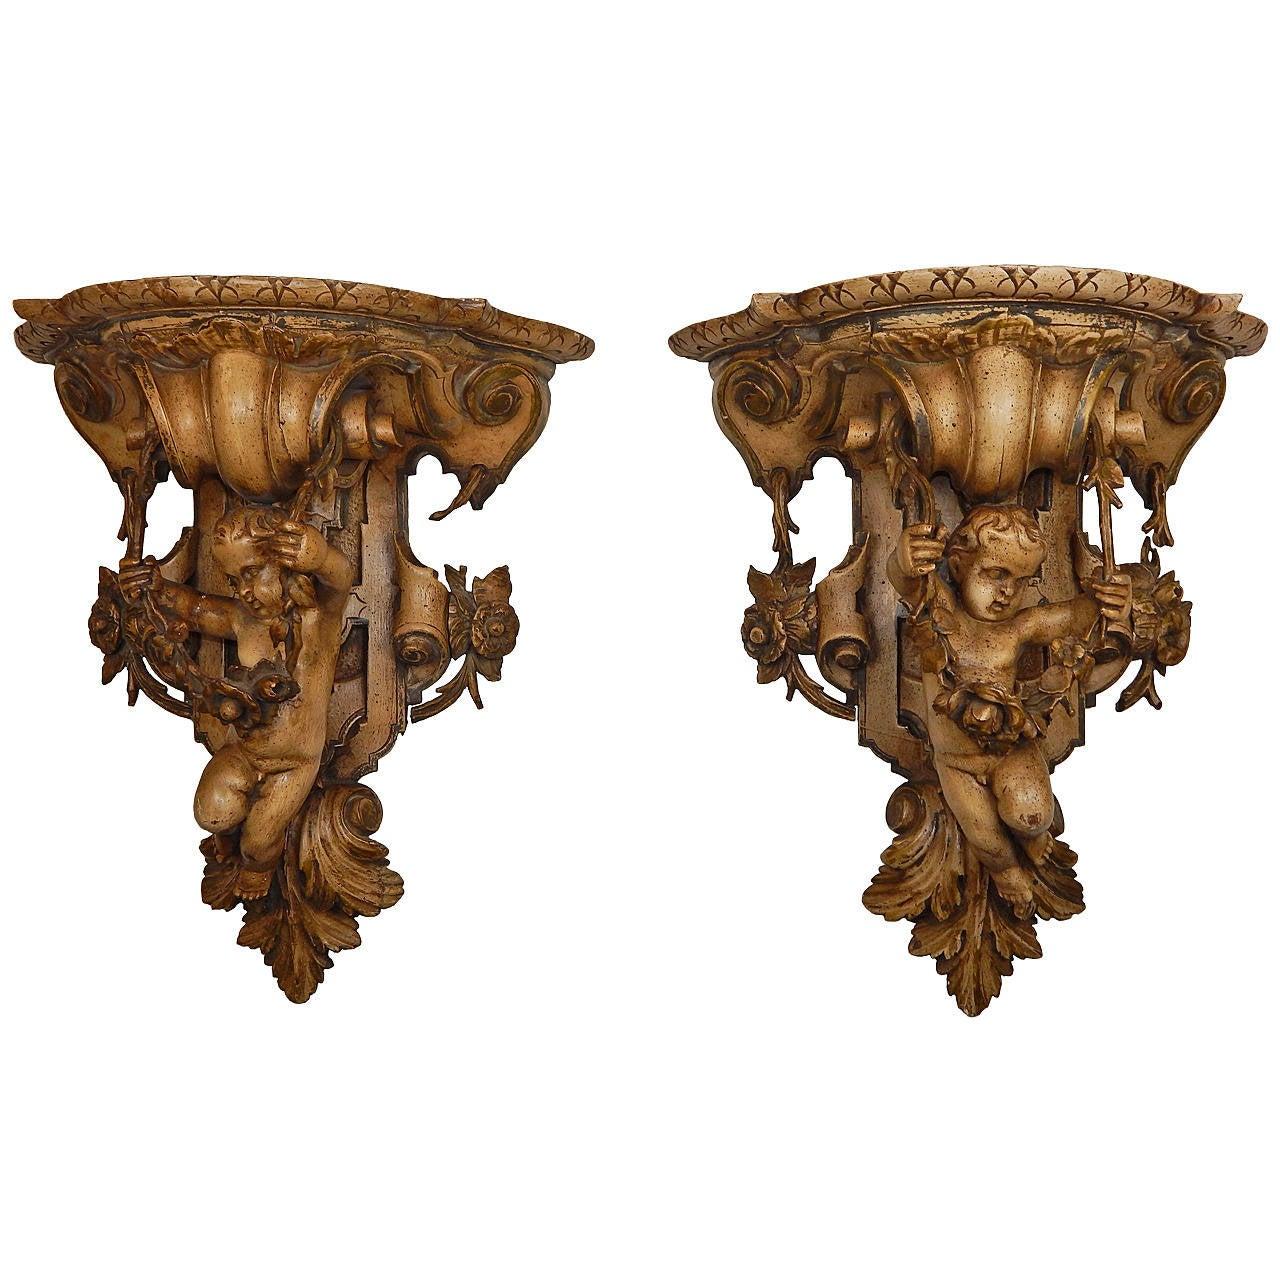 Pair of 19th Century Carved Wood Cherub Wall Brackets